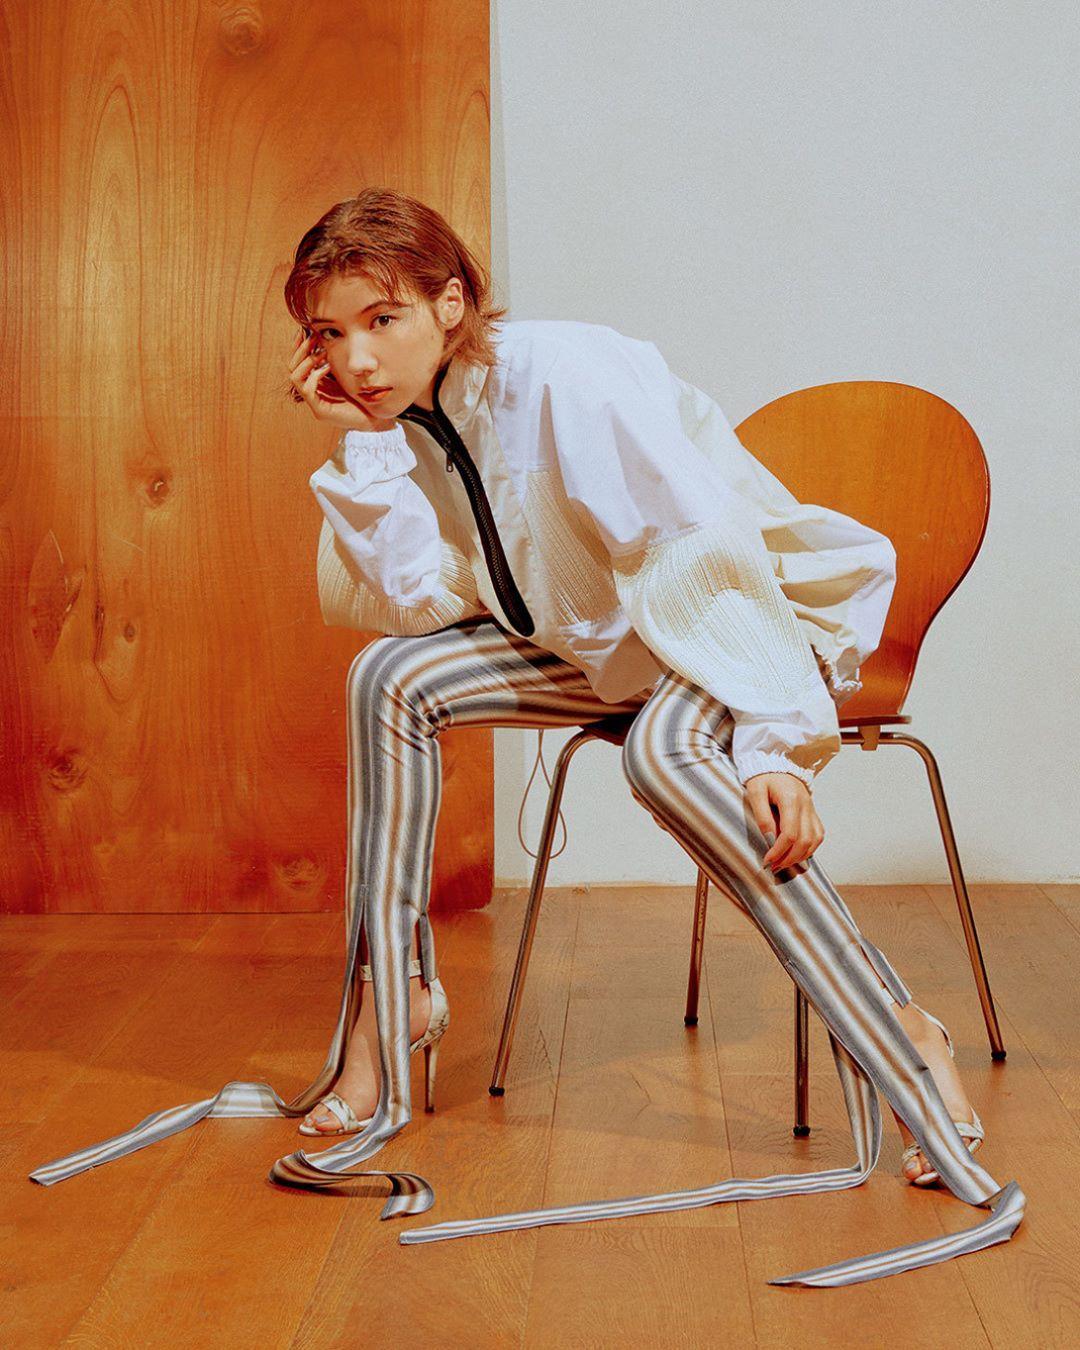 Undefined popsugar pinterest photography fashion and fashion